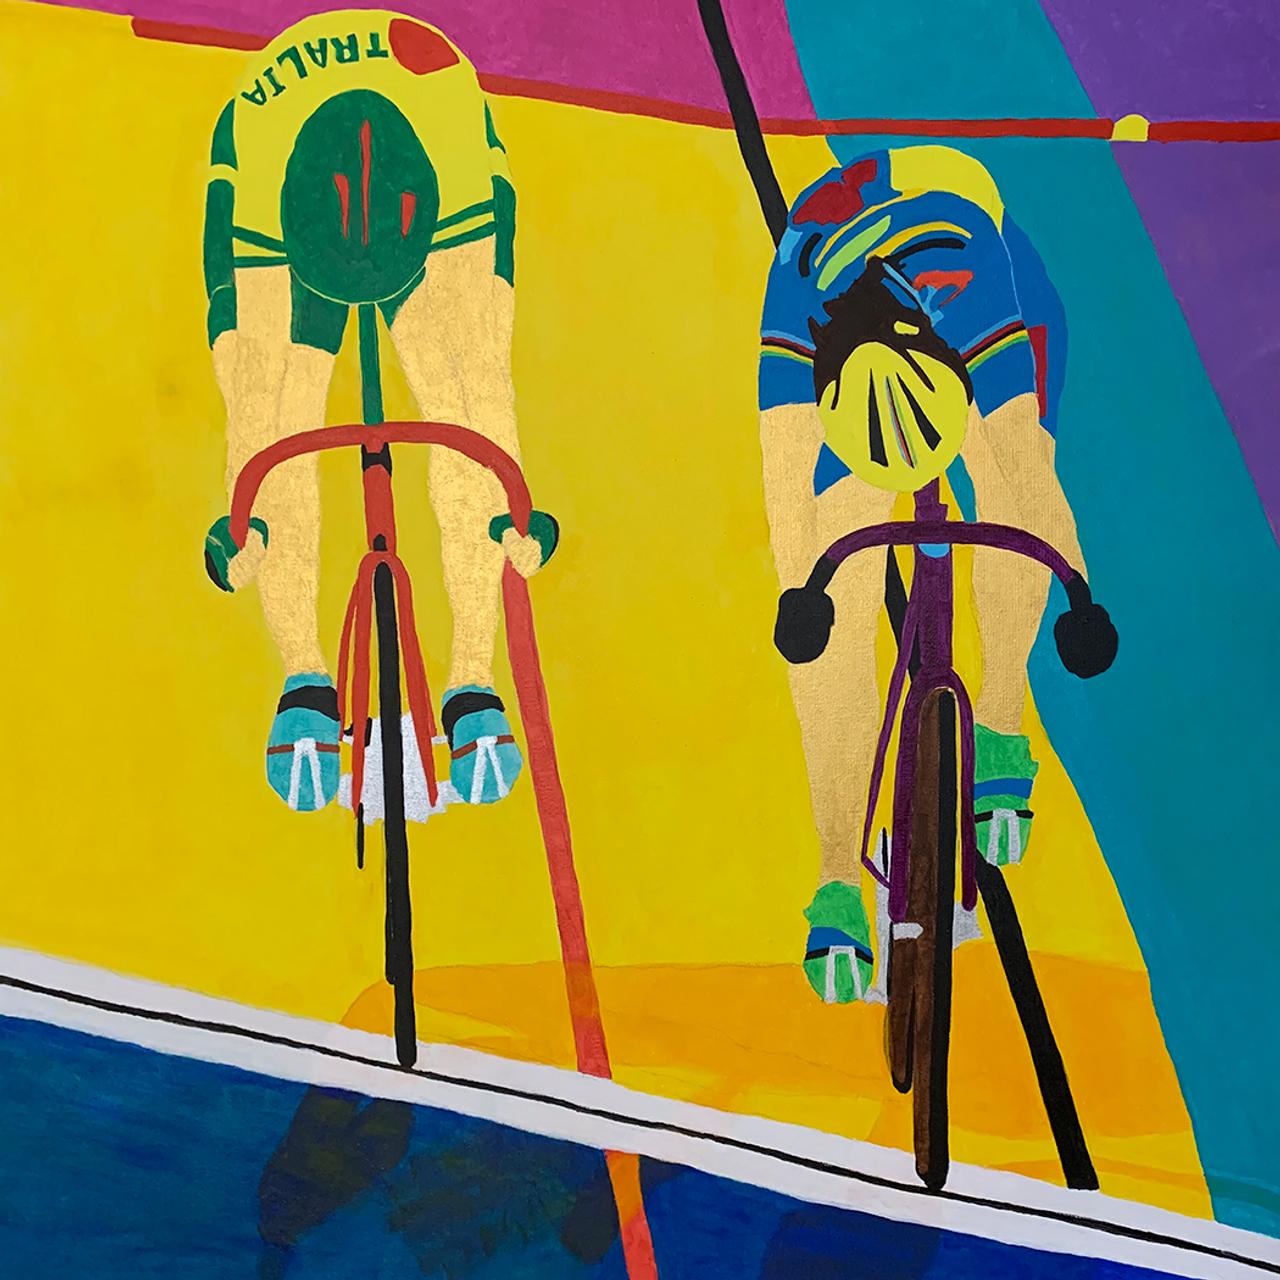 Ferris vs Dubnikoff in the velodrome - original art prints by Sandra Wright Sutherland